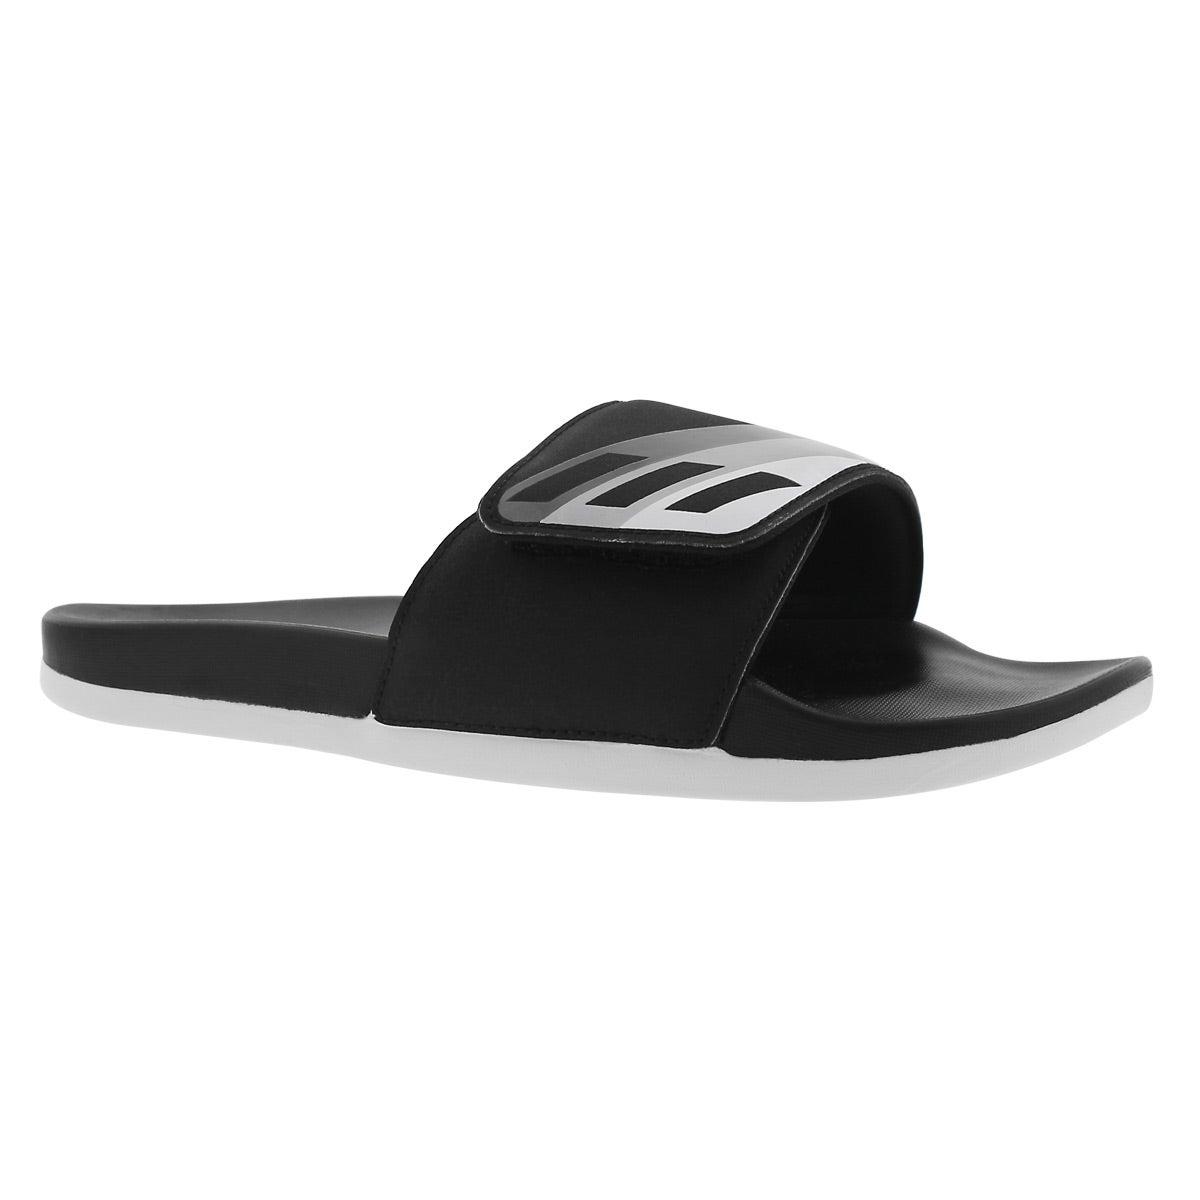 Women's ADILETTE CF ULTRA black adjustable slides